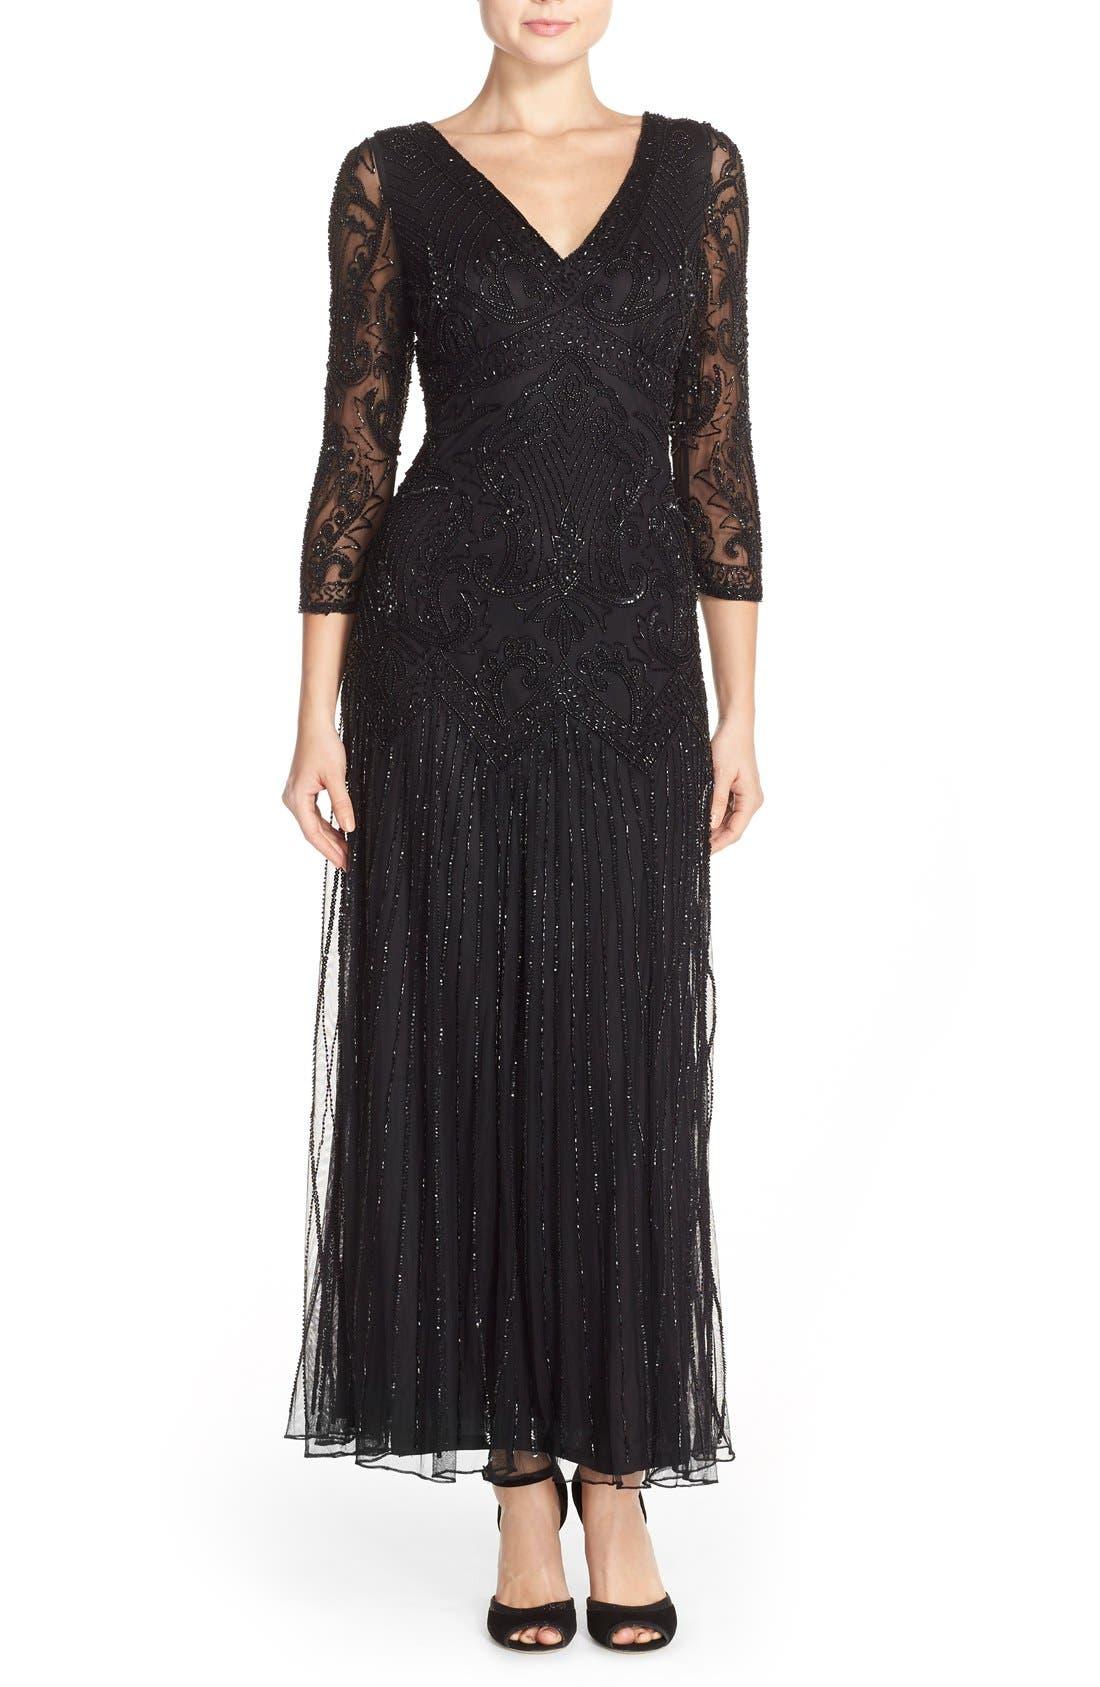 Alternate Image 1 Selected - Pisarro Nights Embellished Mesh Gown